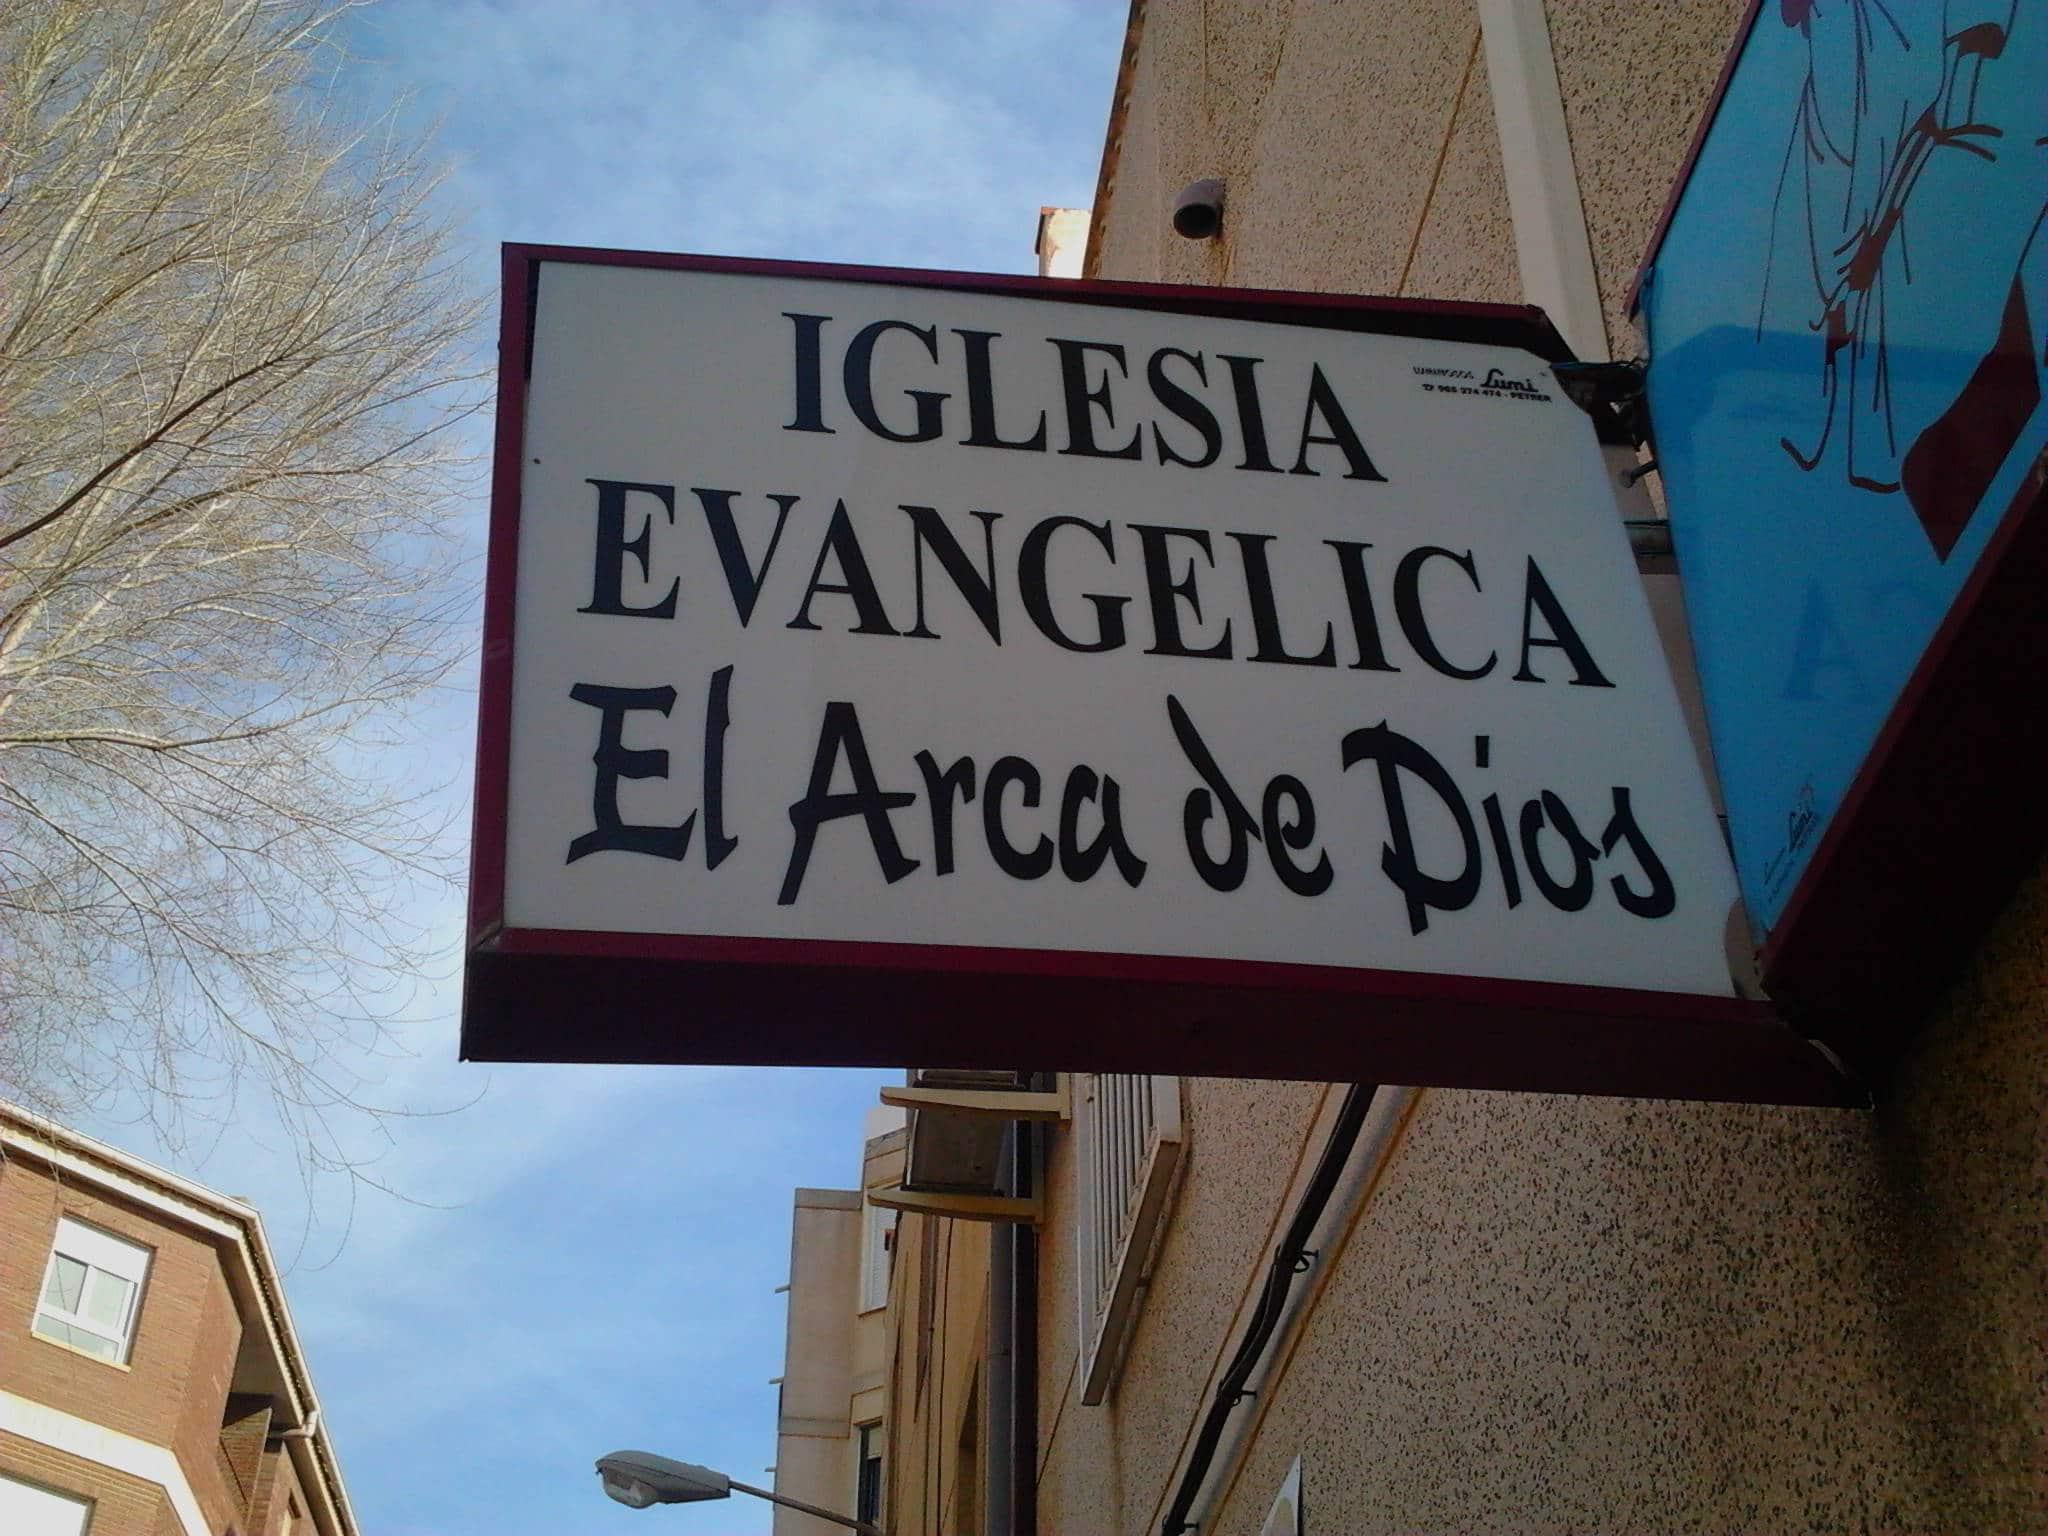 Conozca la verdadera Historia de la Iglesia Evangélica